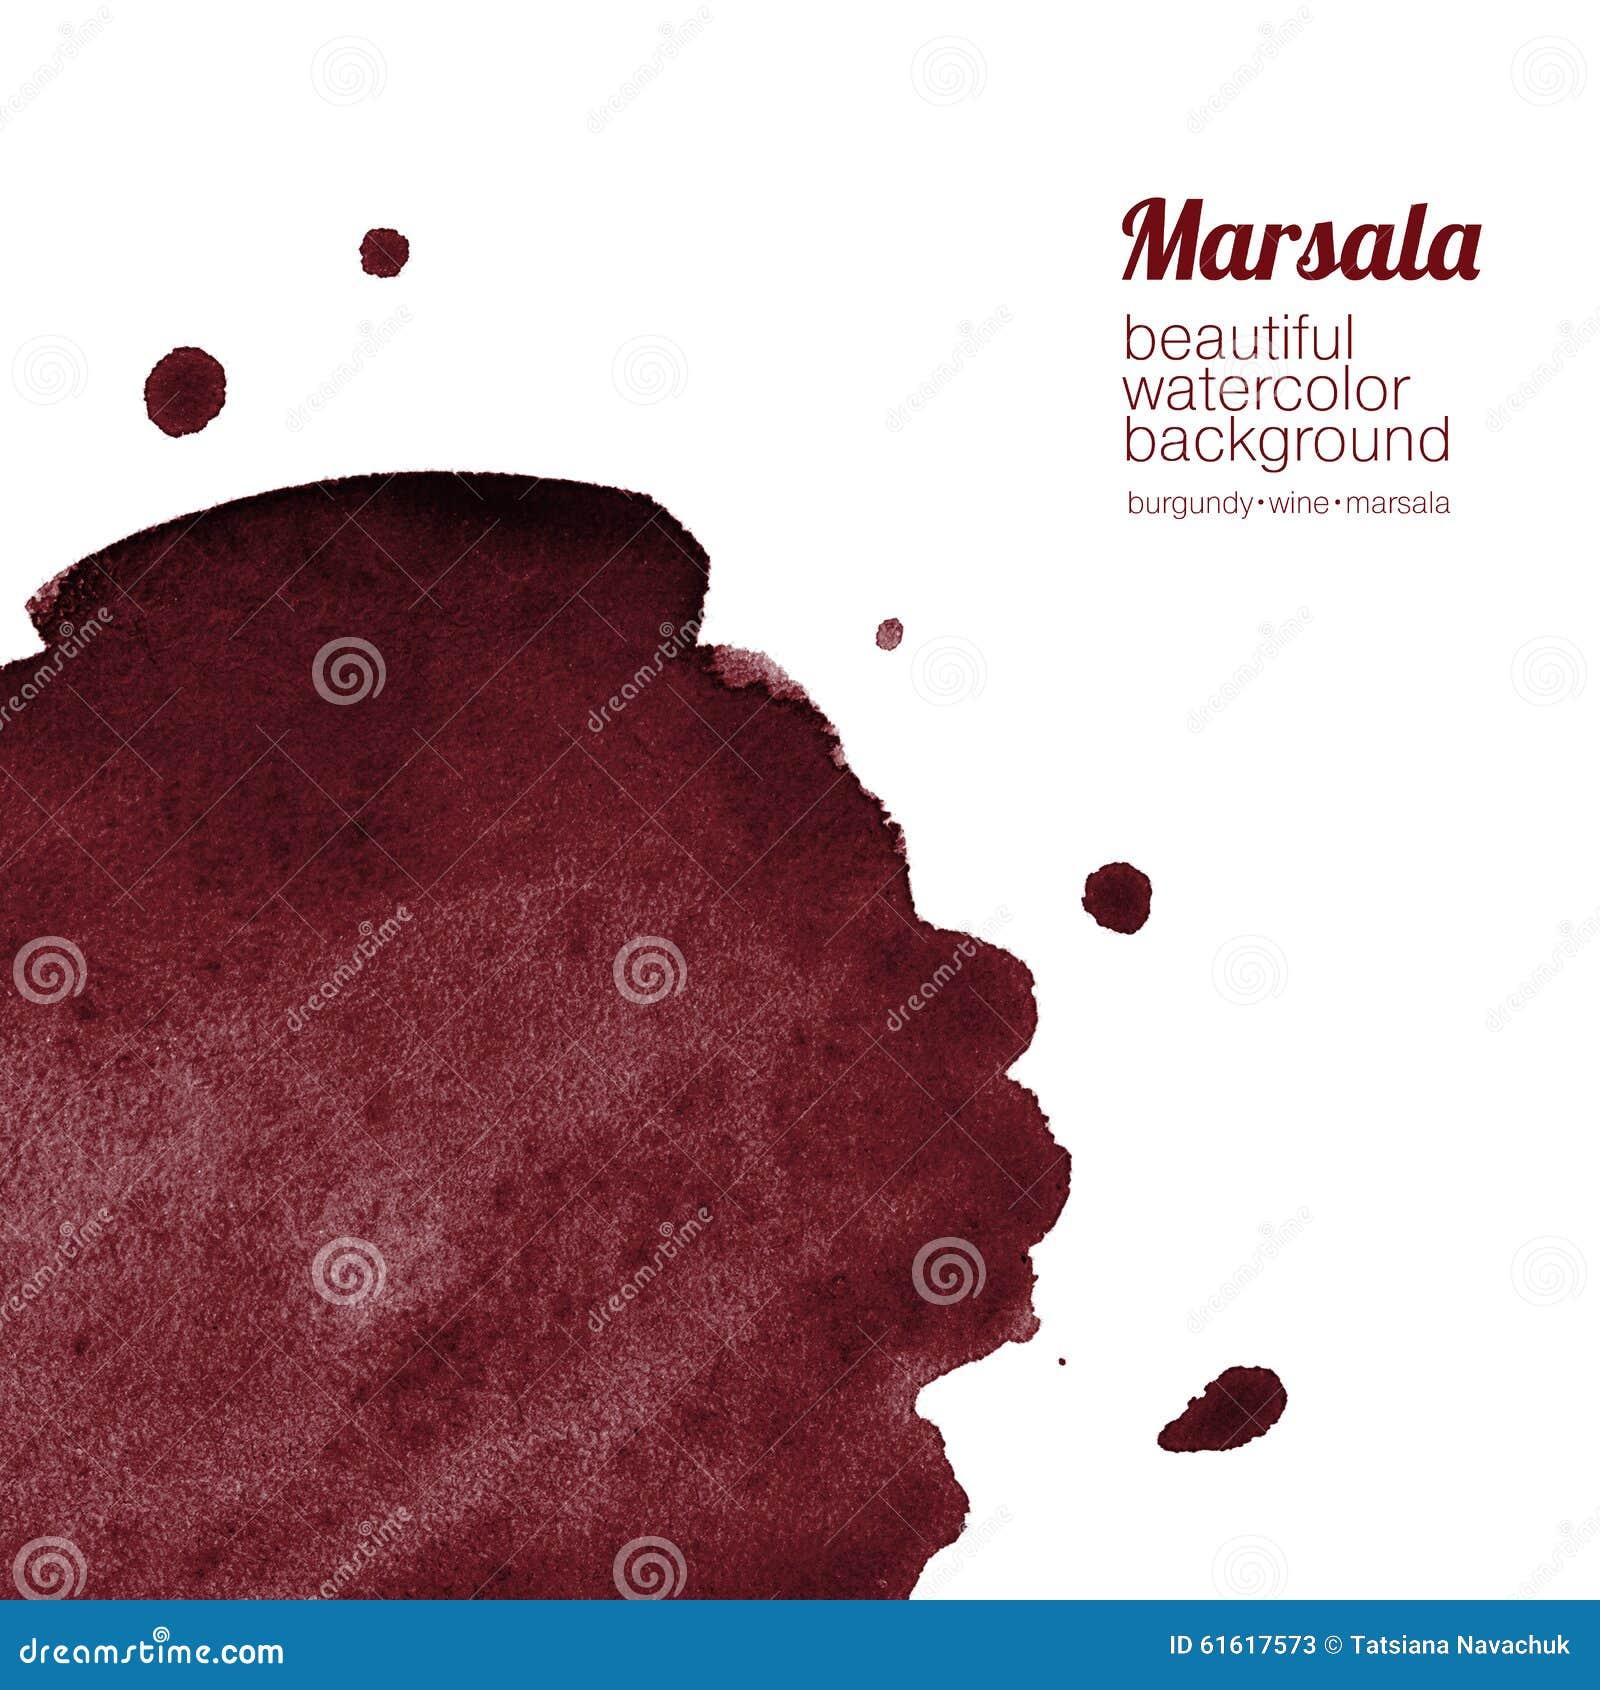 Burgundy, Wine, Marsala Watercolor Background Stock ...